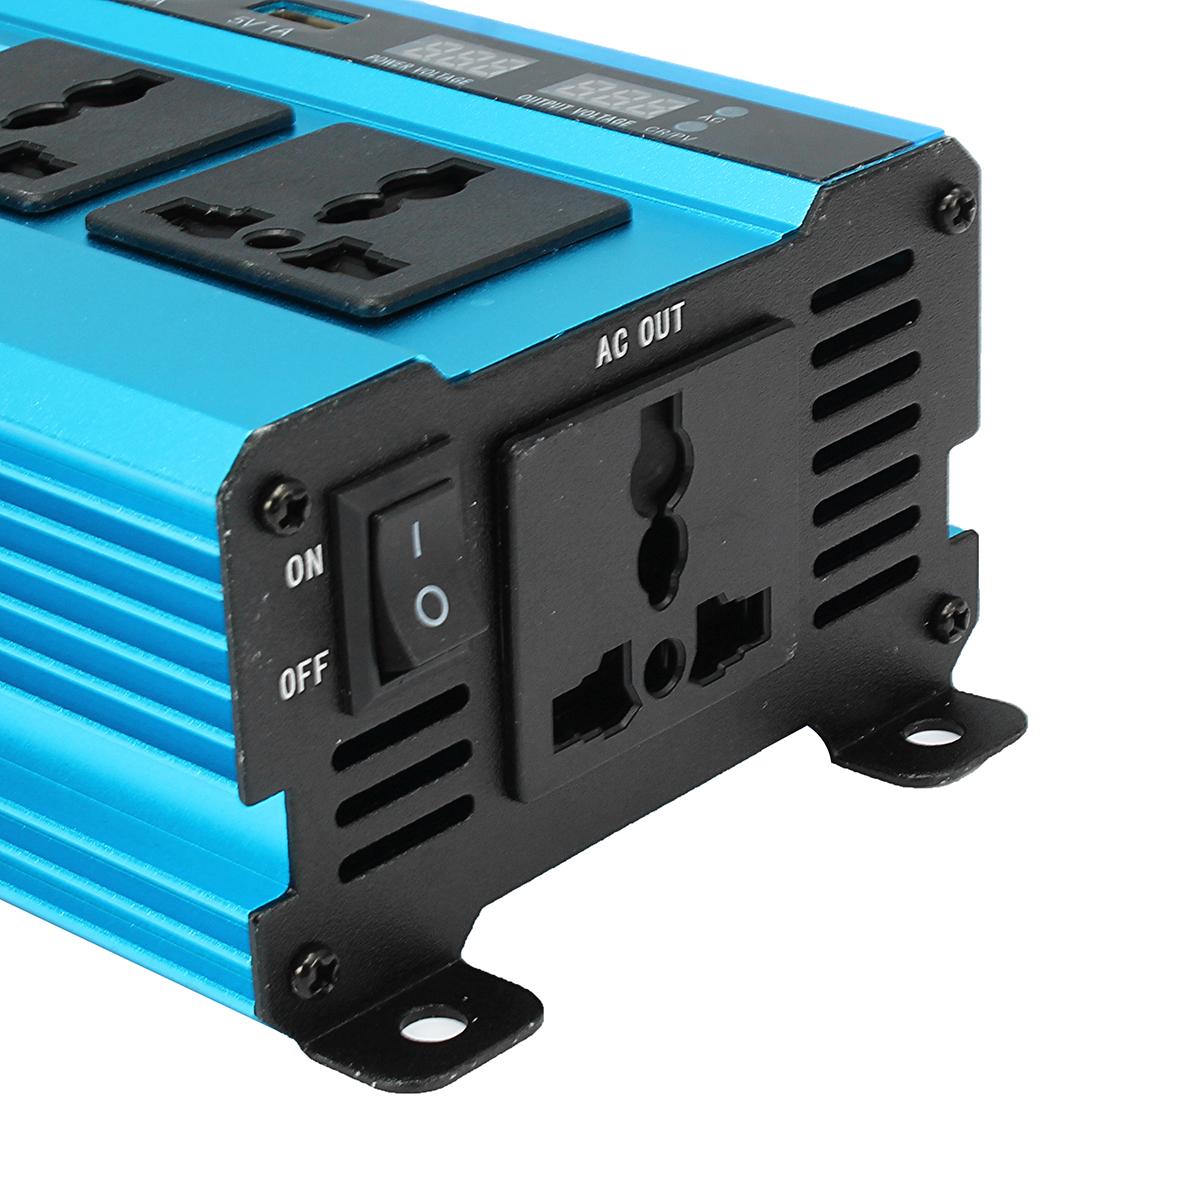 Solar Power Inverter 5000W Peak DC 12/24/48V To AC 220V Modified Sine Wave Converter